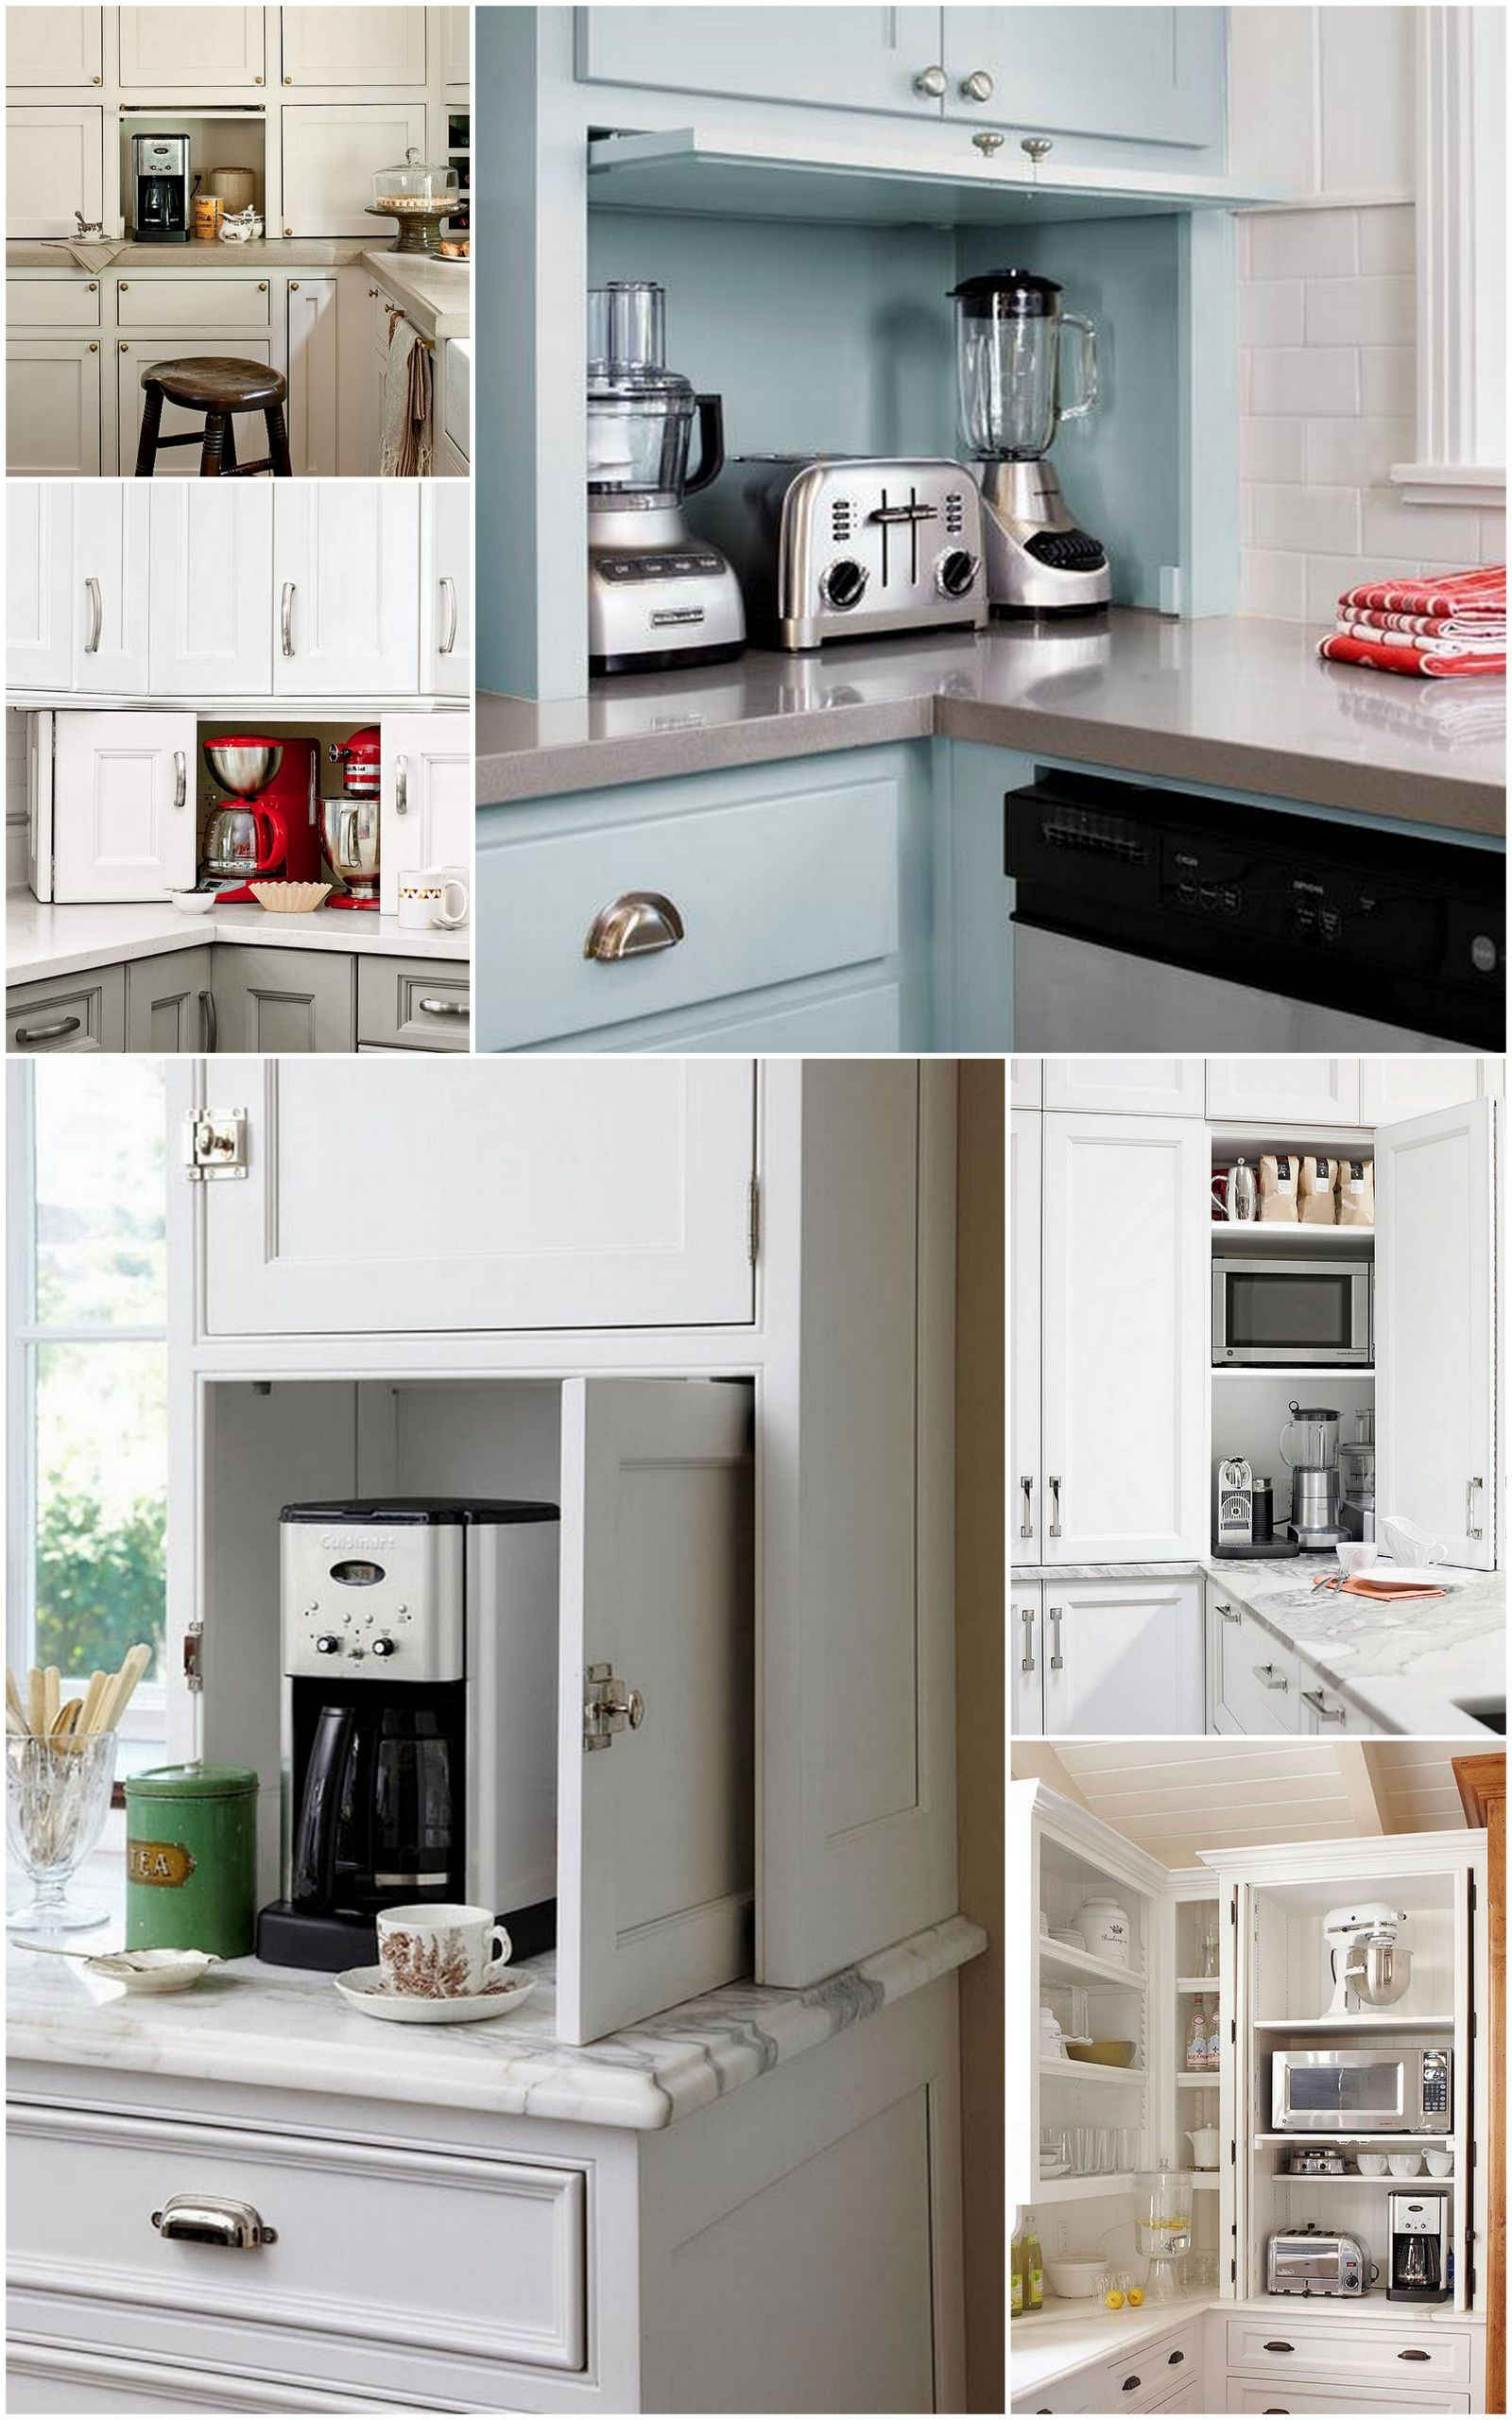 Kitchen Appliance Storage Unique the Ideal Kitchen Appliance Storage